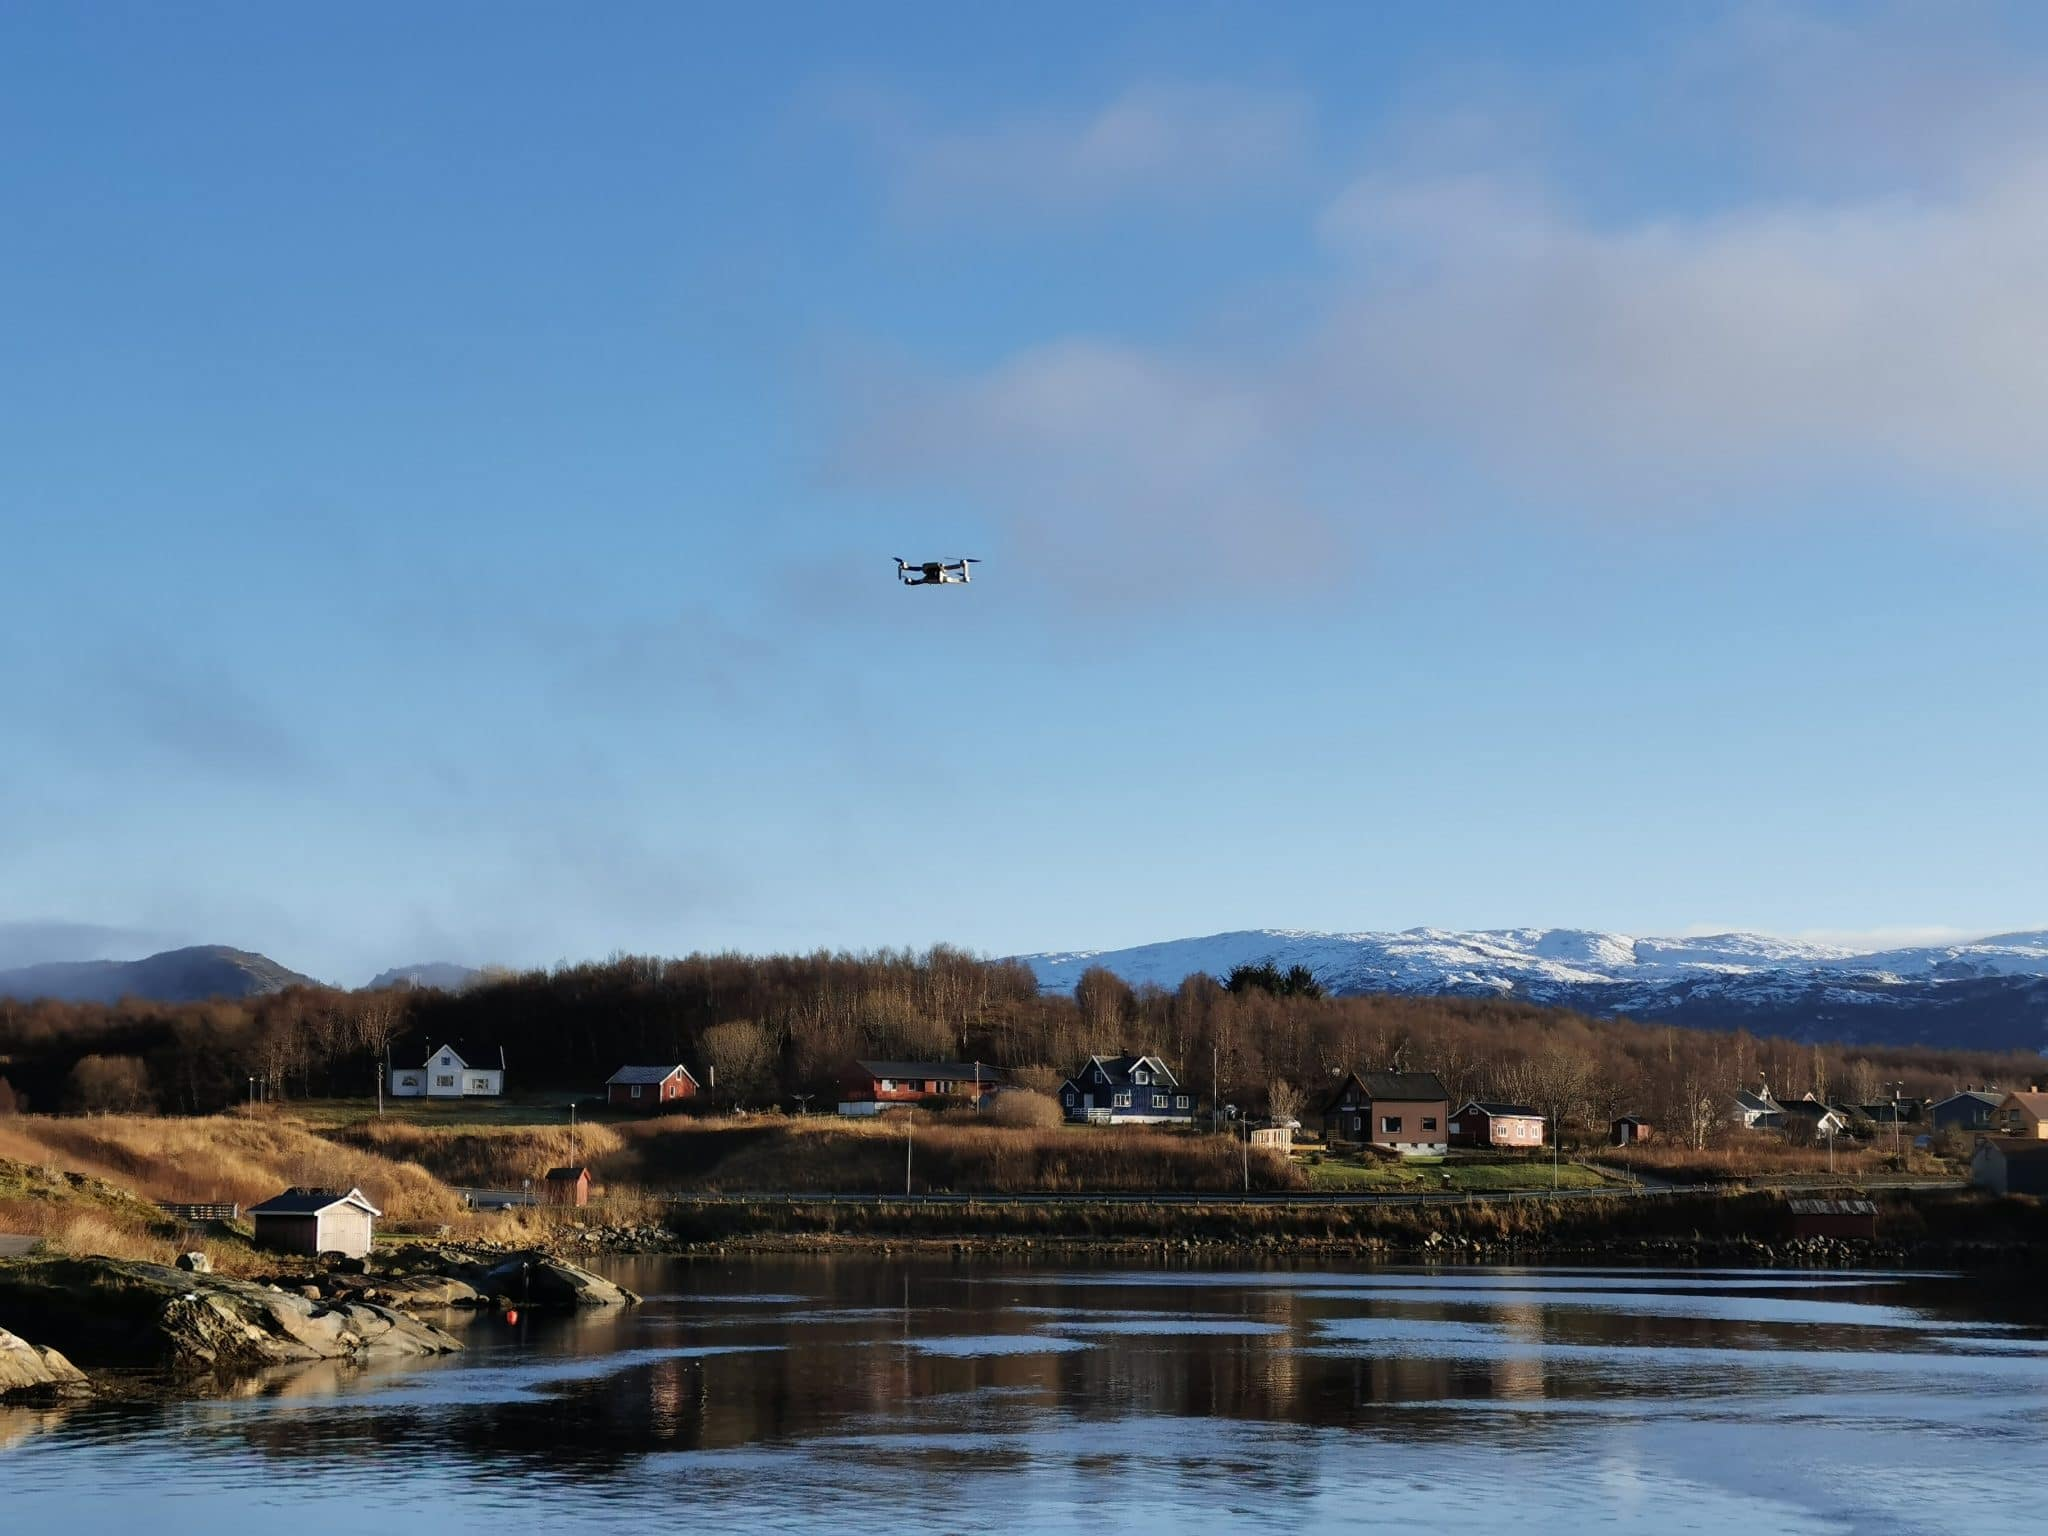 Mavic mini flying in norway